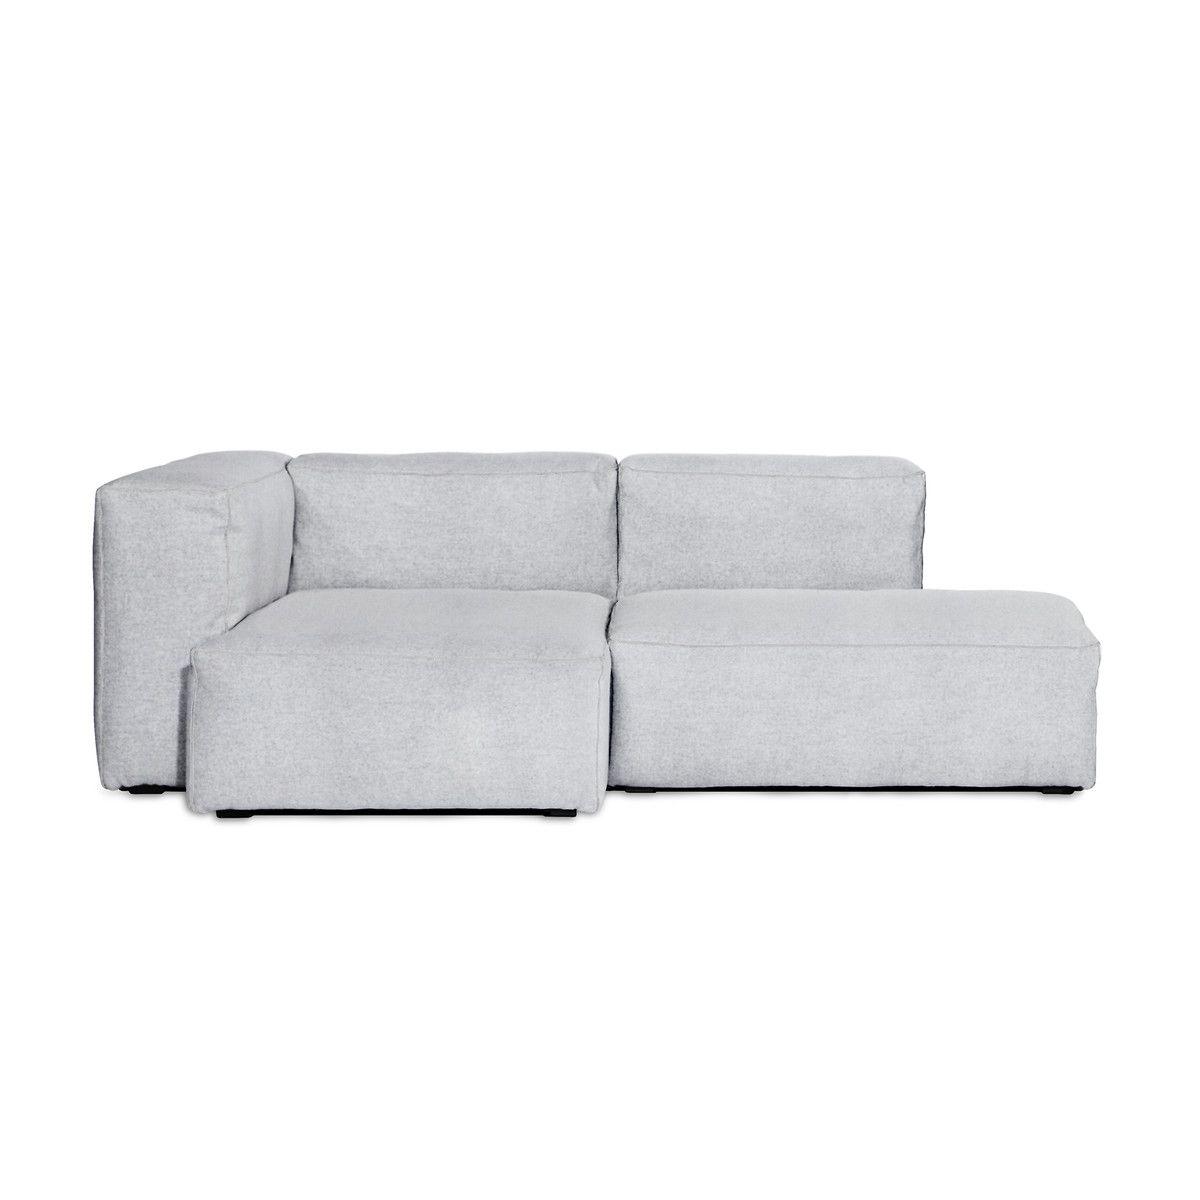 Hay - Mags Soft Sofa 2.5 Sitzer (Kombination 3 S8262 + S9302 ...